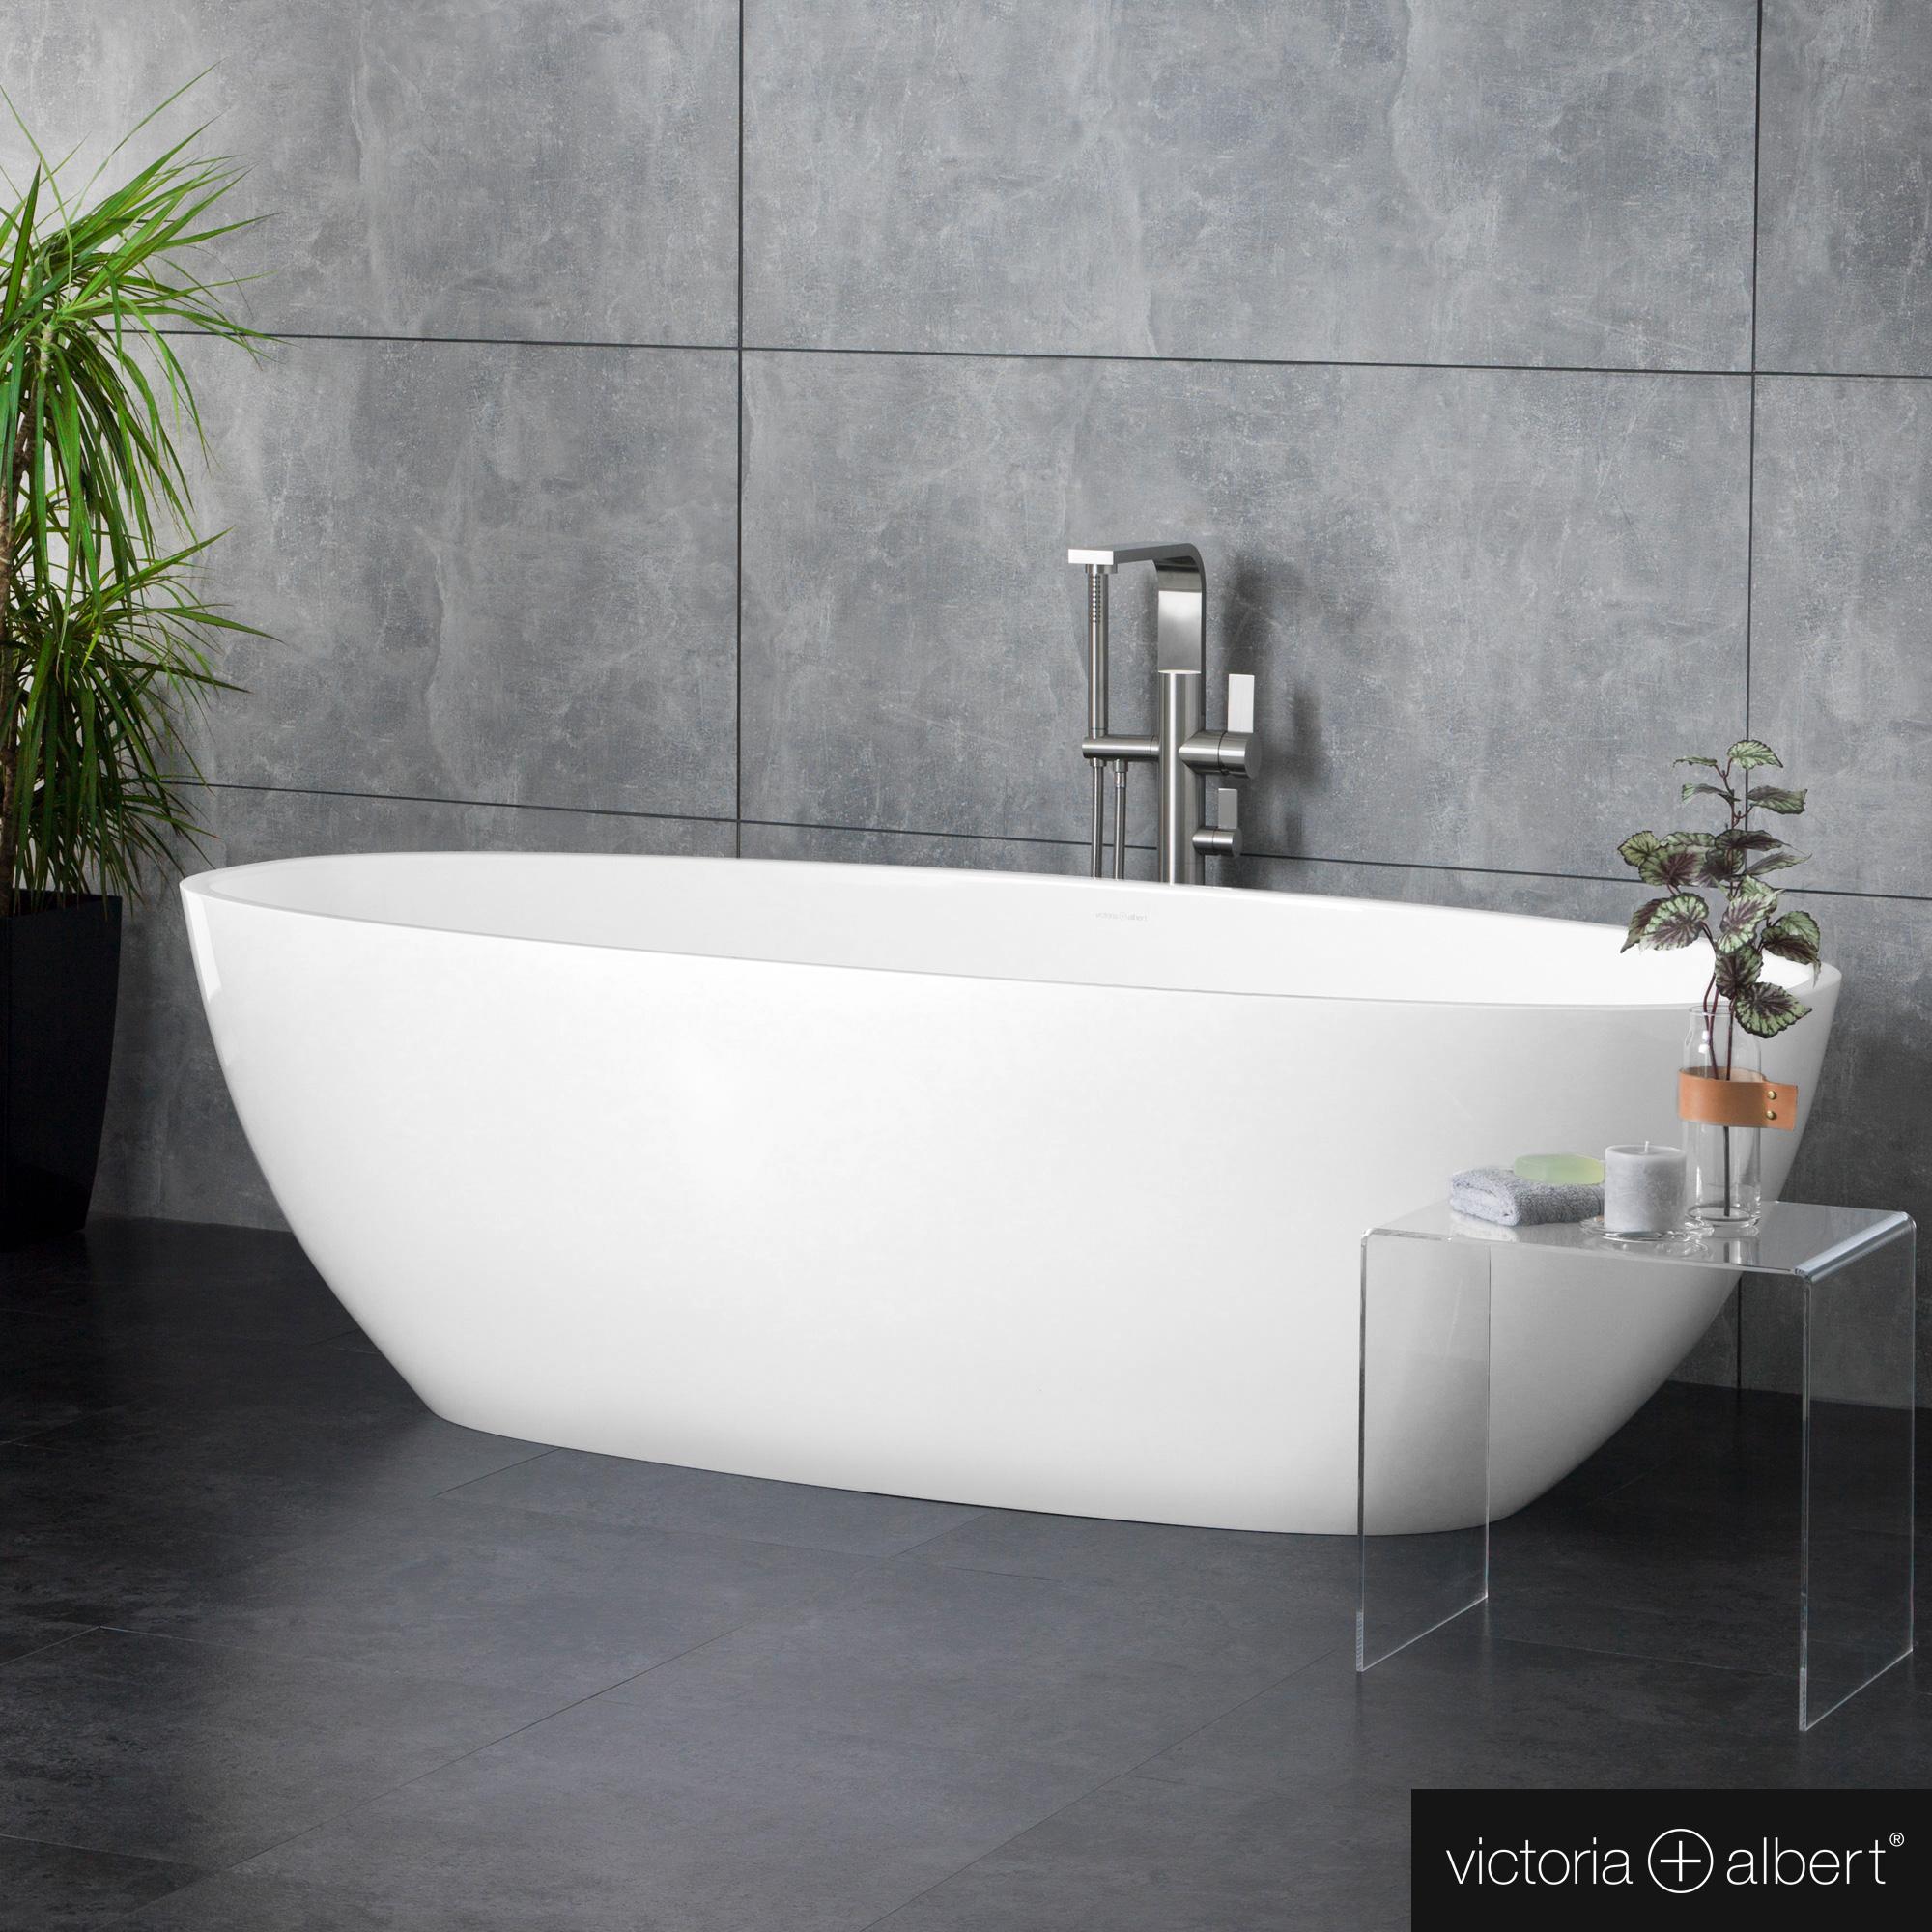 Victoria Albert Barcelona Freestanding Oval Bath White Gloss Interior White Gloss Bar N Sw No Reuter